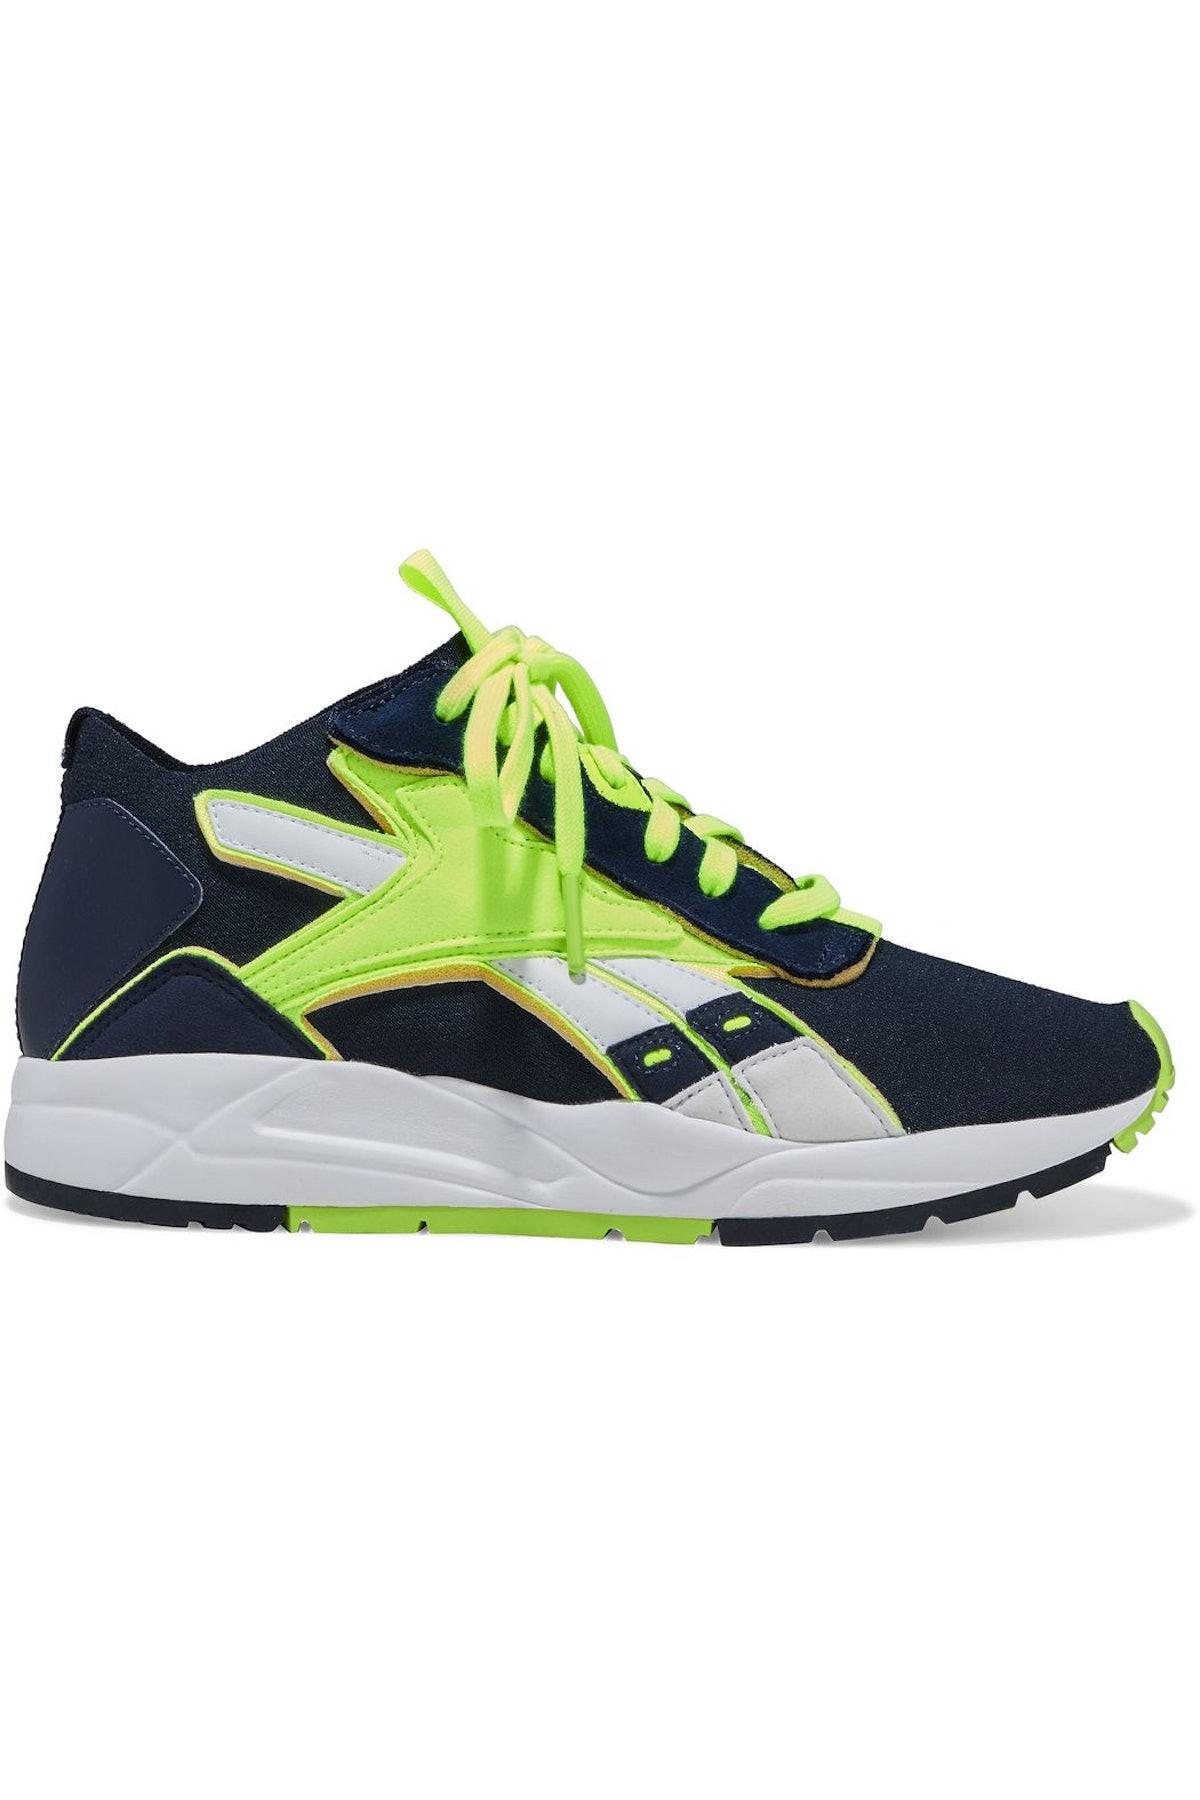 Reebok X Victoria Beckham sneakers